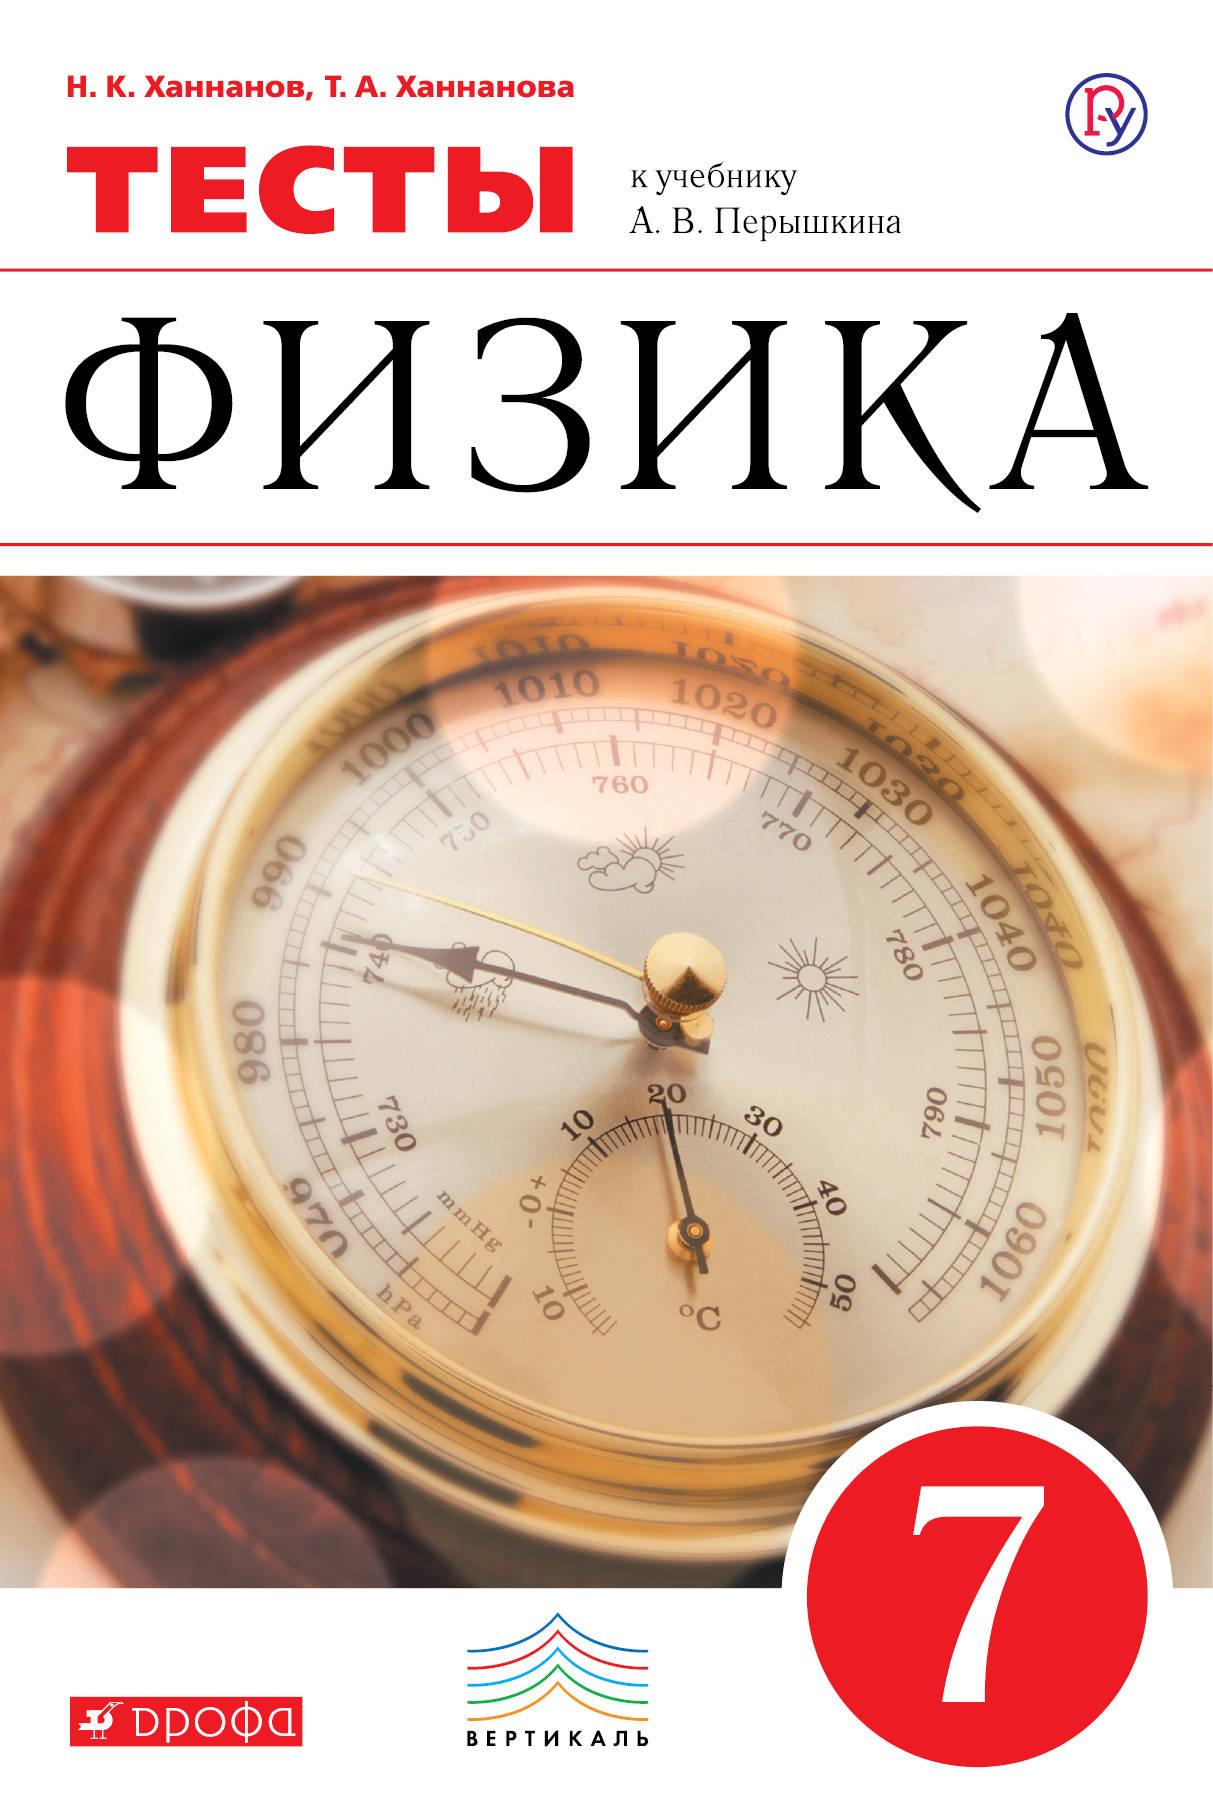 Н. К. Ханнанов,Т. А. Ханнанова Физика. 7 класс. Тесты. н к ханнанов т а ханнанова физика 9 класс тесты